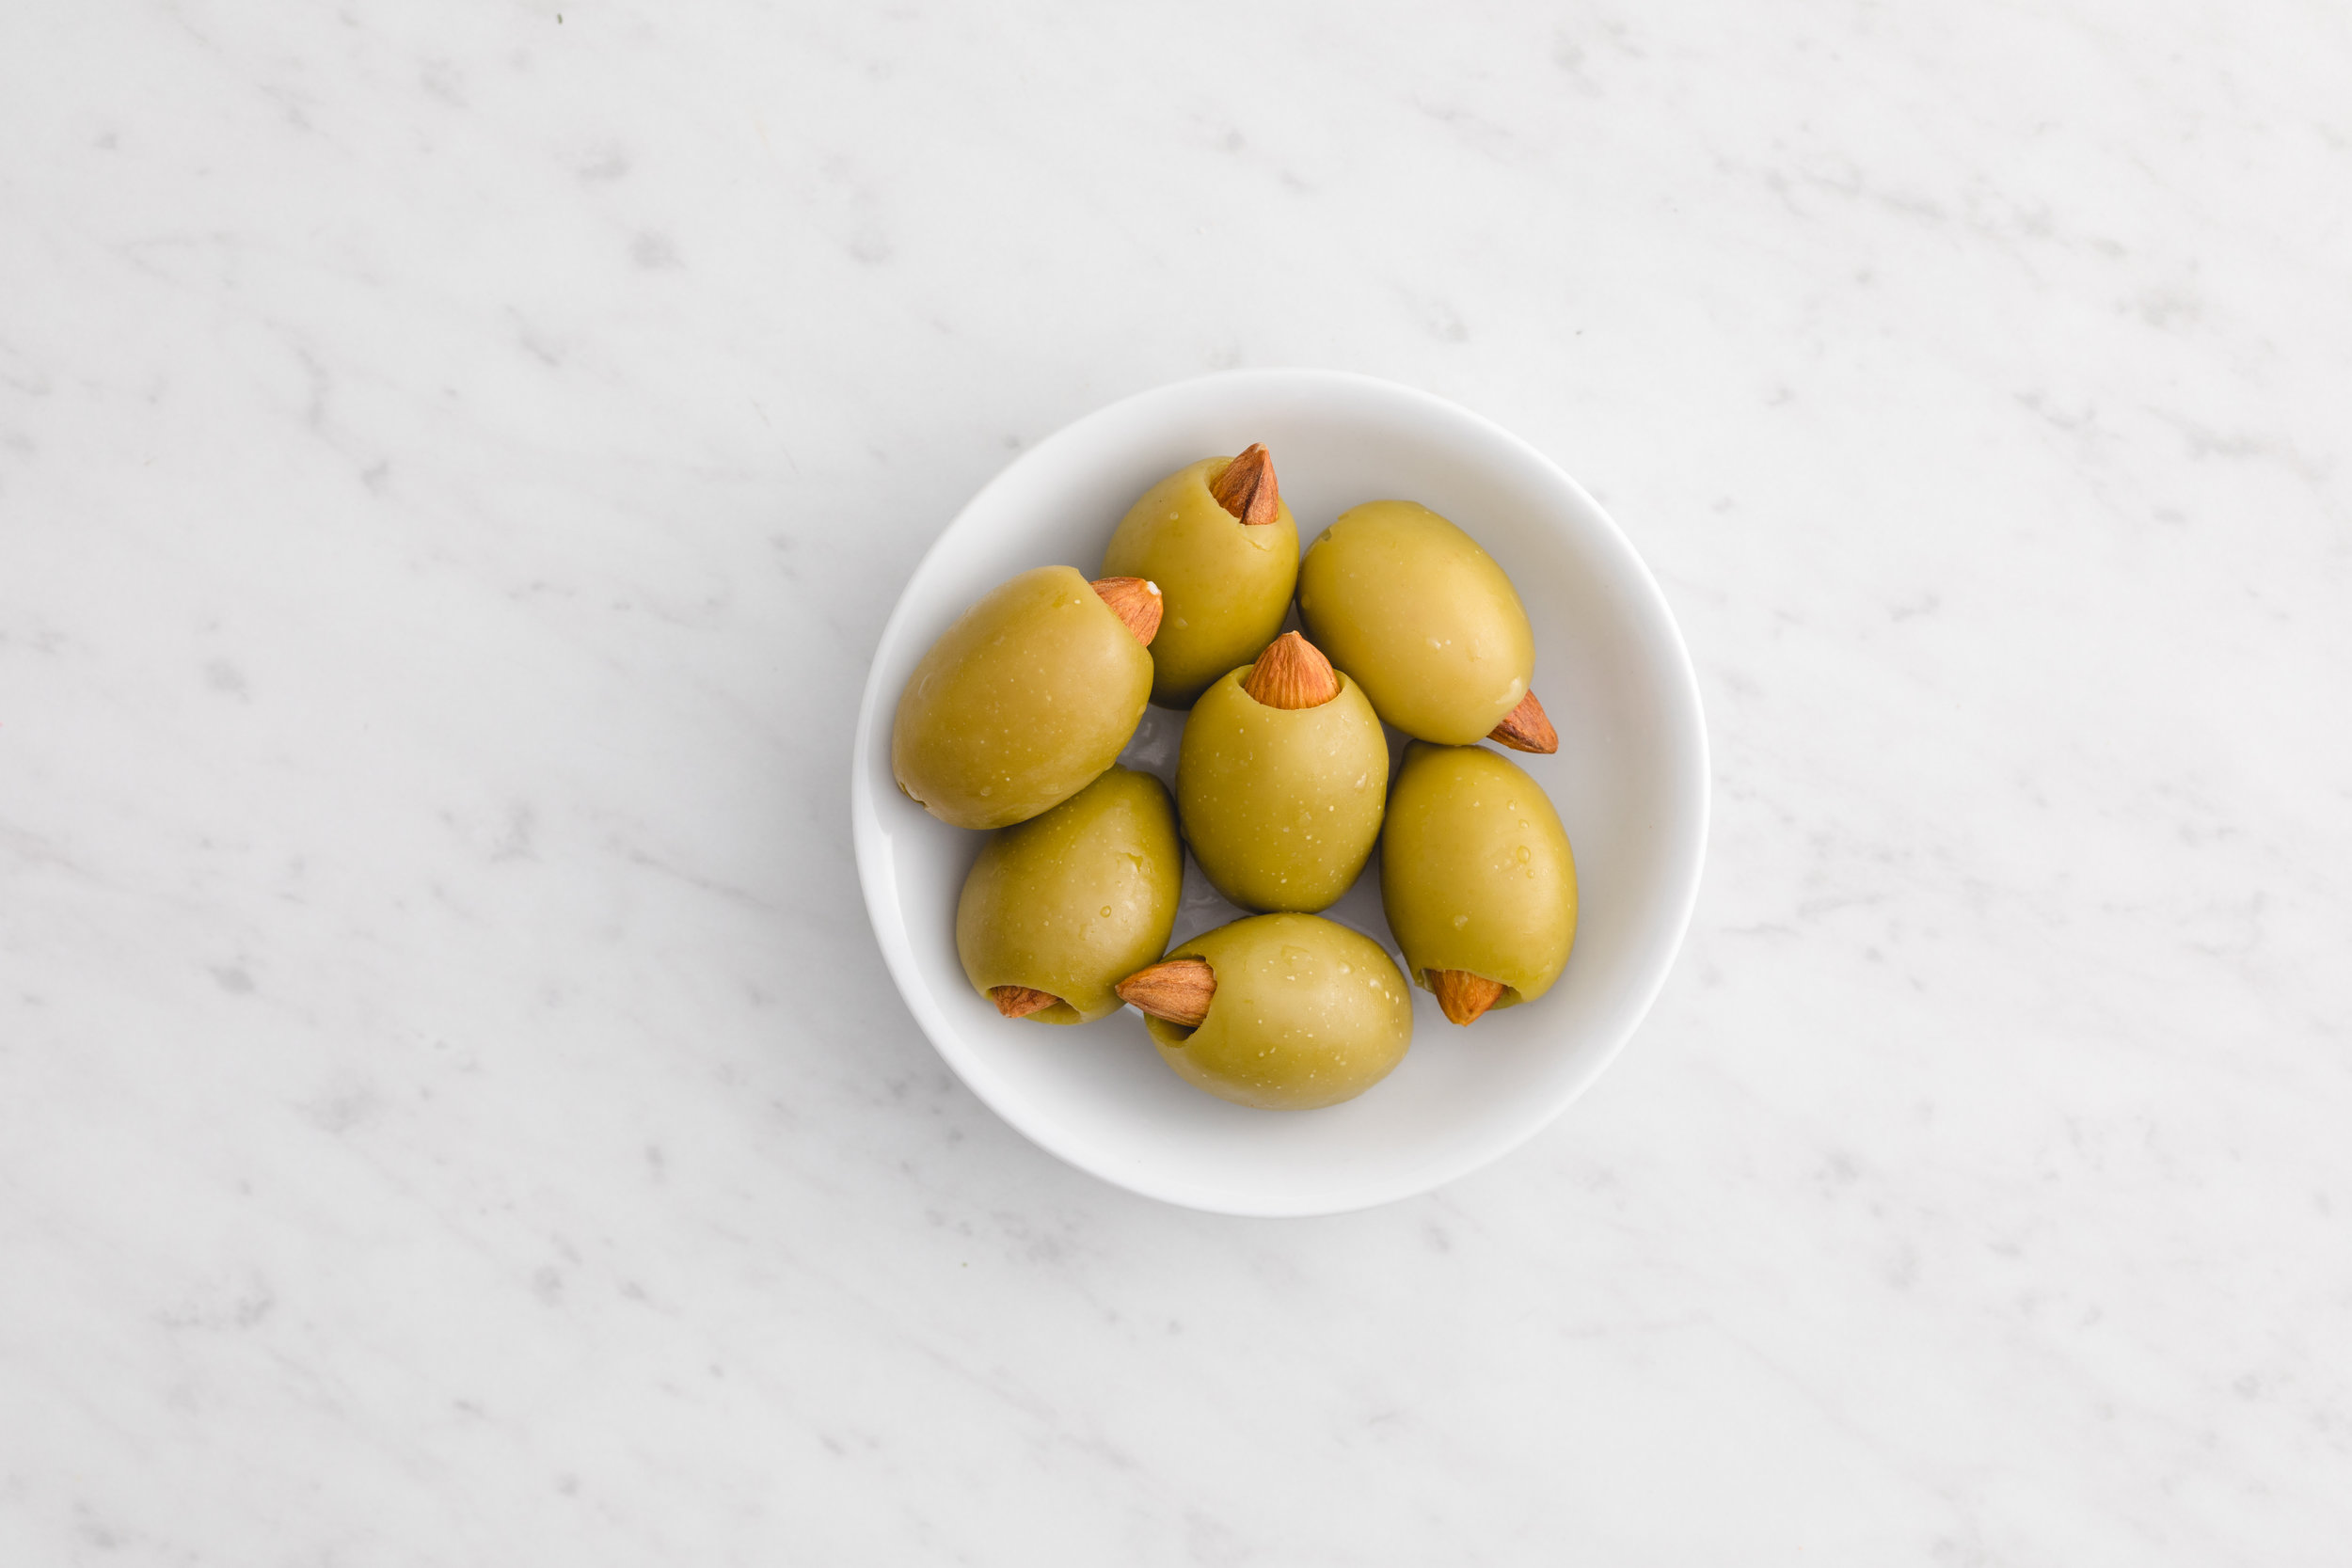 HH_10_Almond Stuffed Olives_06.jpg